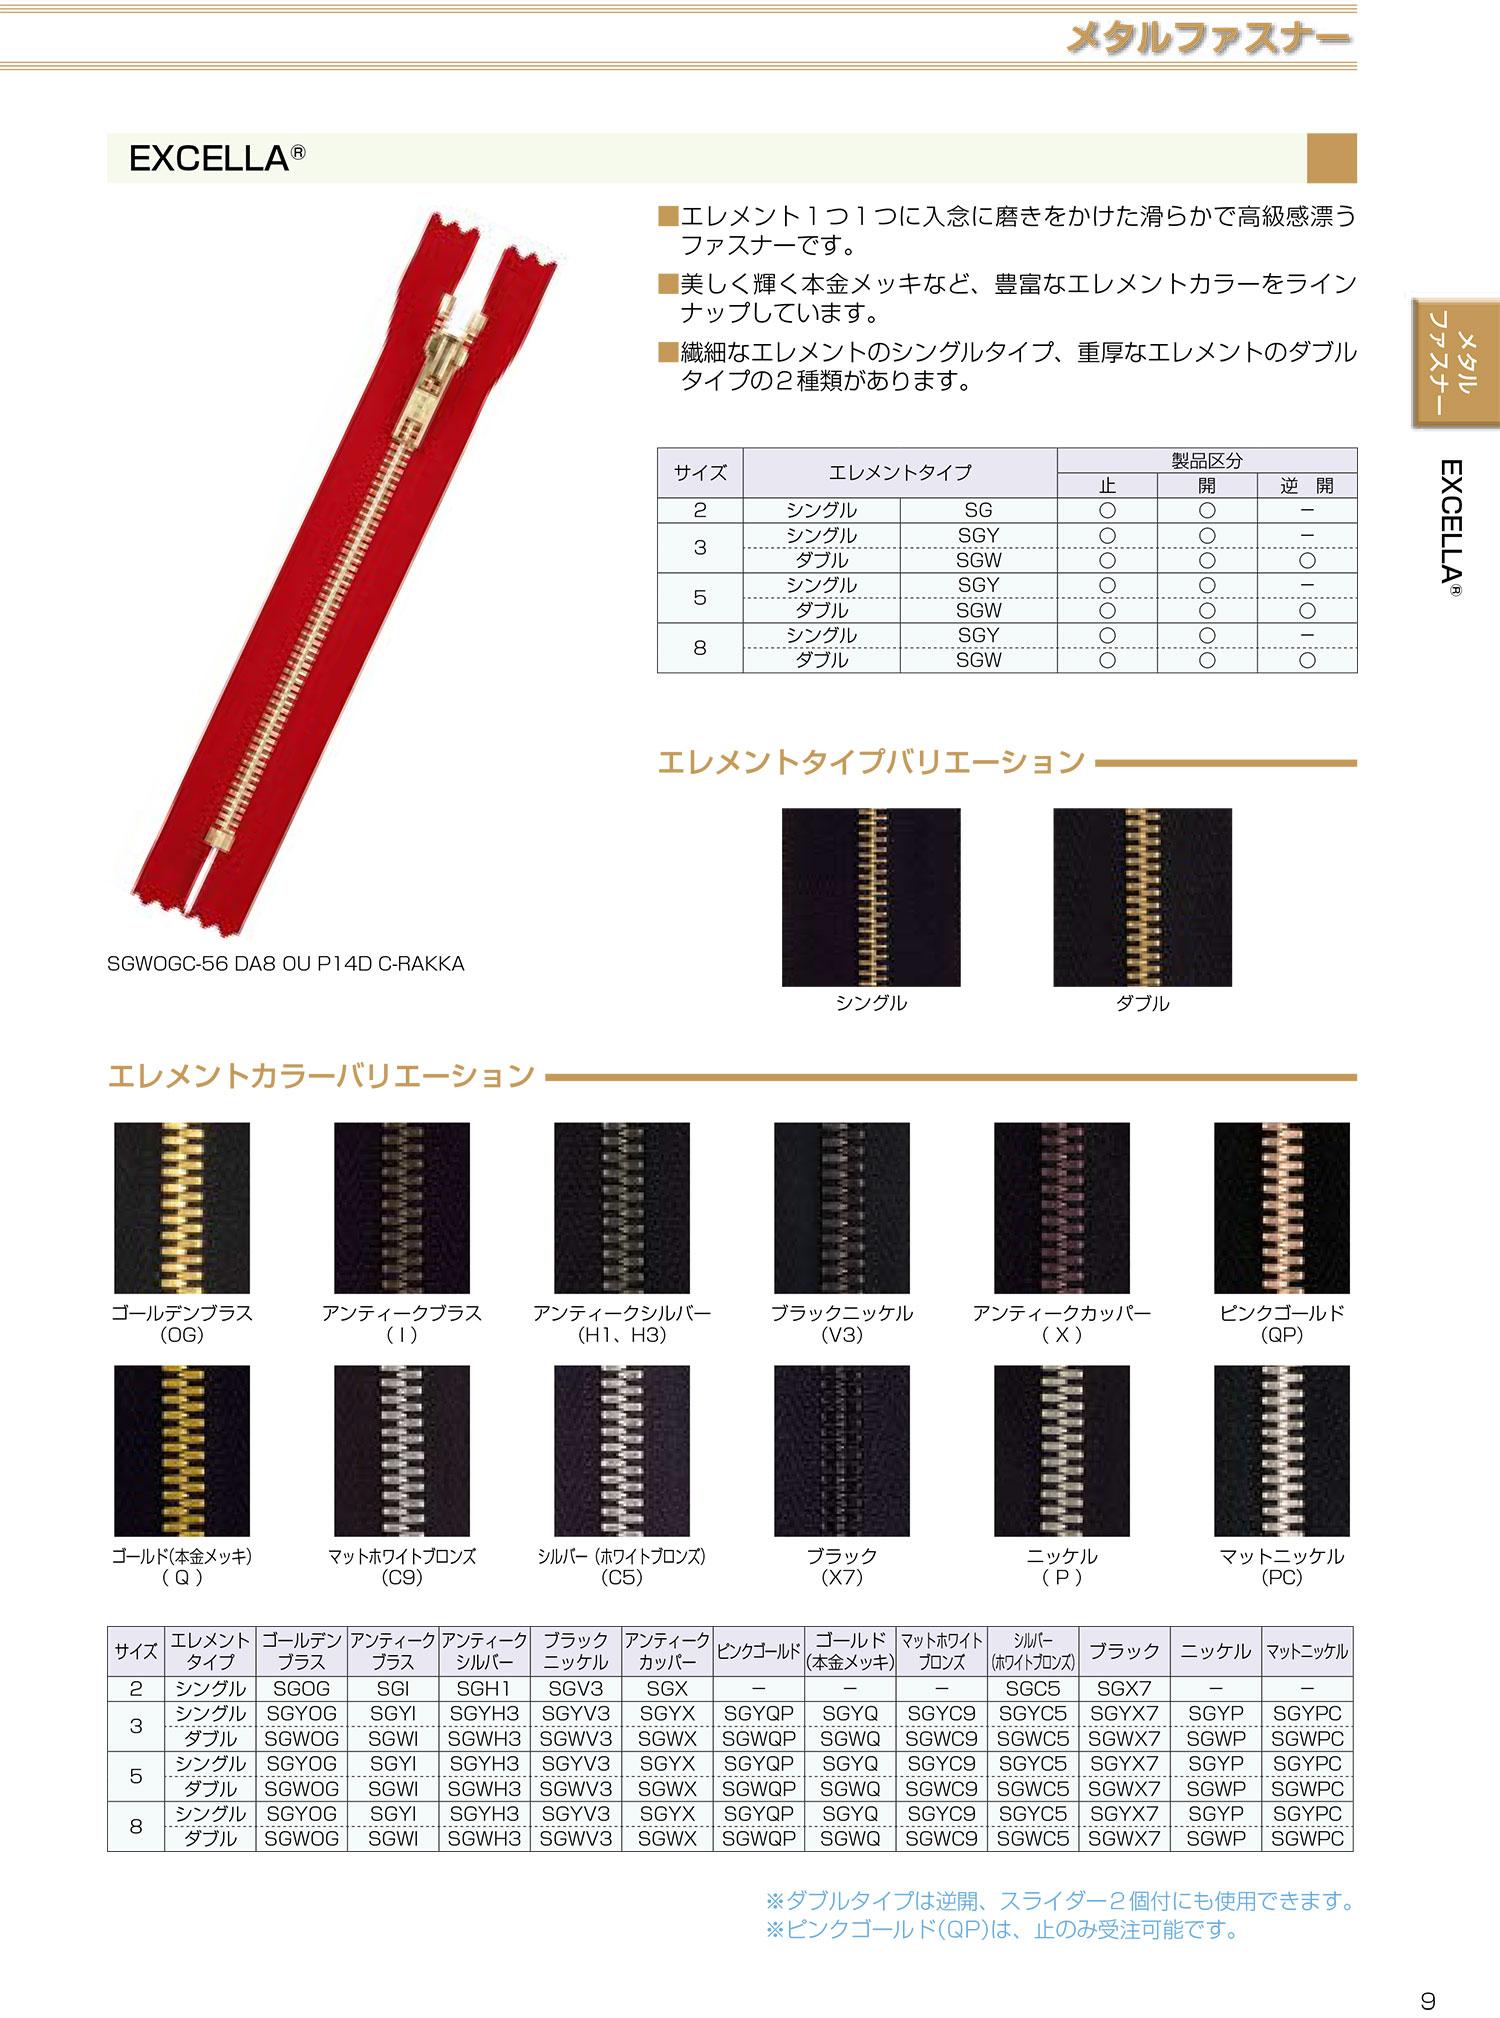 8SGWPOR エクセラ 8サイズ ニッケル オープン ダブル[ファスナー] YKK/オークラ商事 - ApparelX アパレル資材卸通販